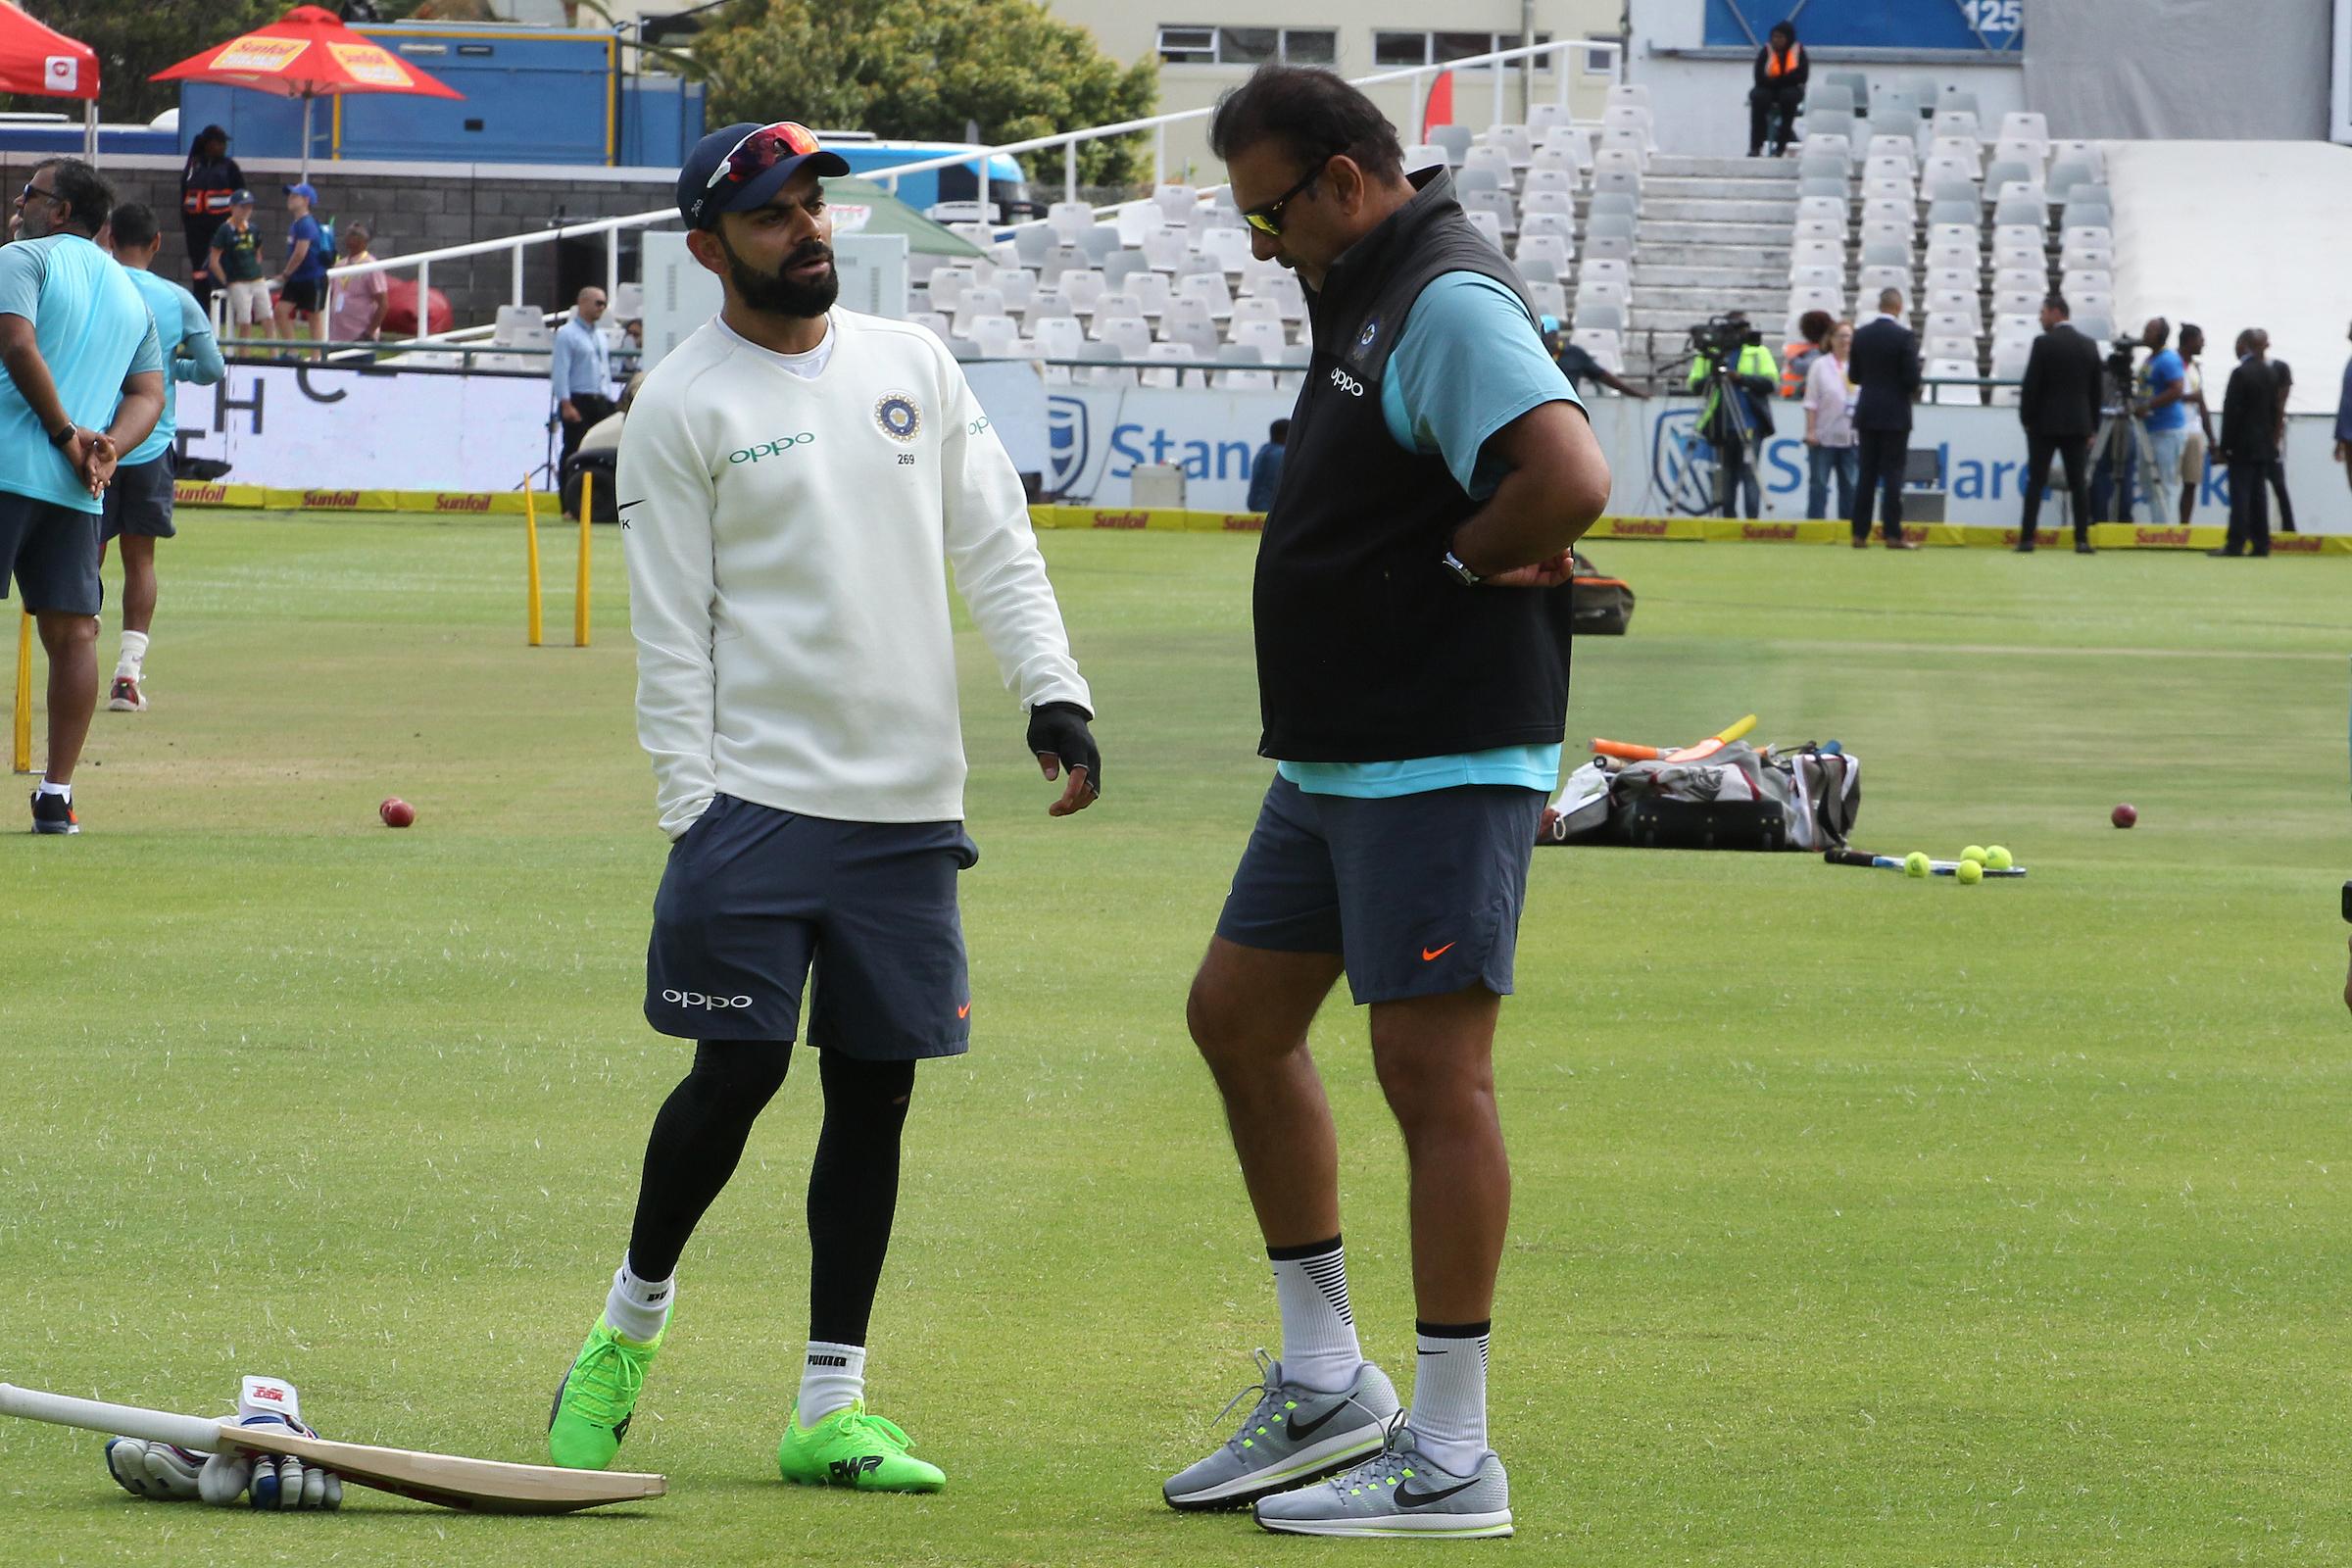 Head coach Ravi Shastri has been keeping a close eye on Virat Kohli so far on this tour (Image: BCCI/Sportzpics)